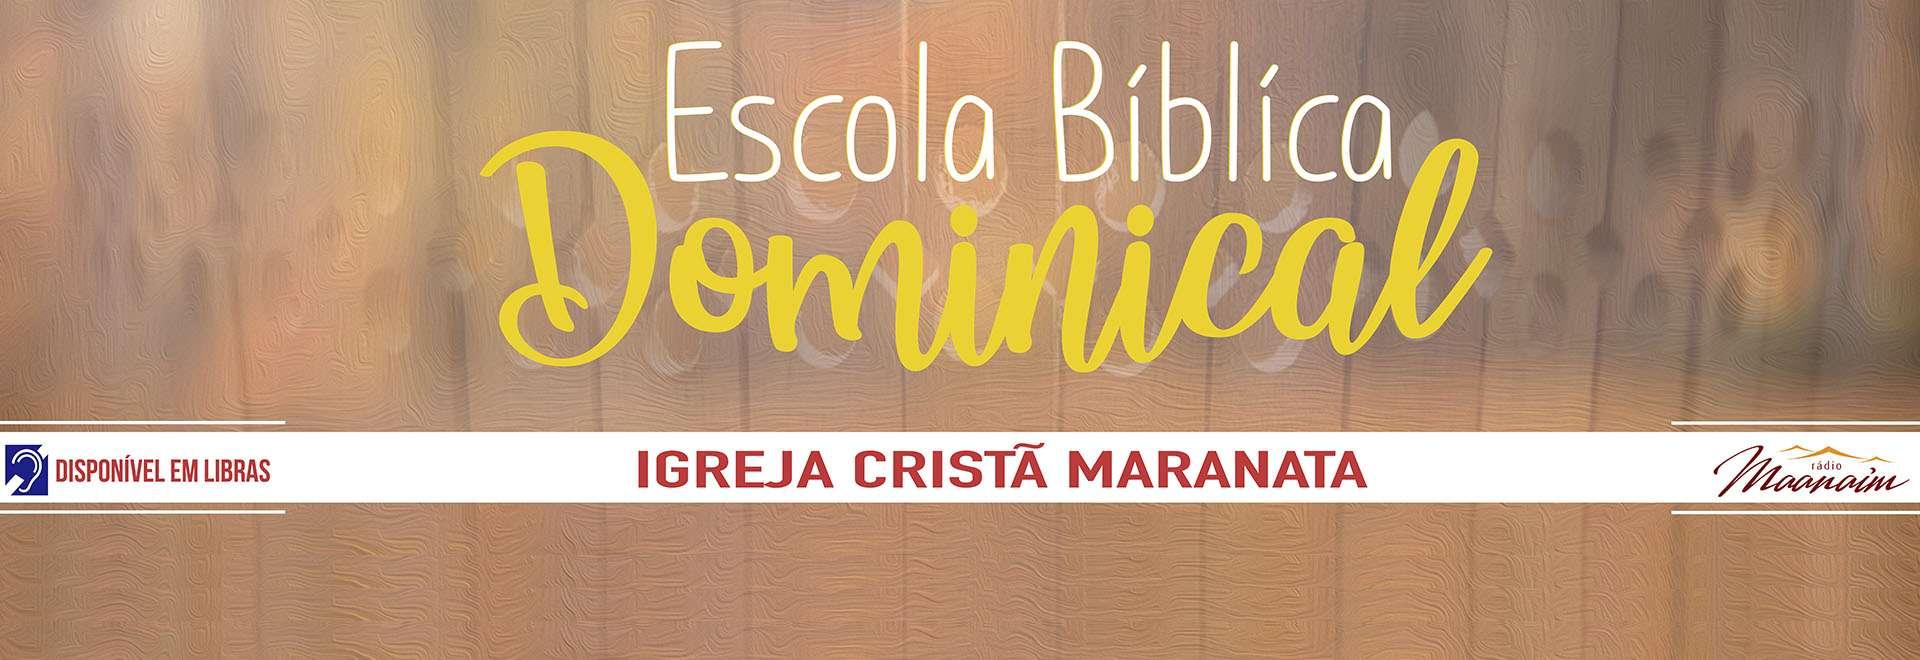 Participações da EBD da Igreja Cristã Maranata - 10/01/2020